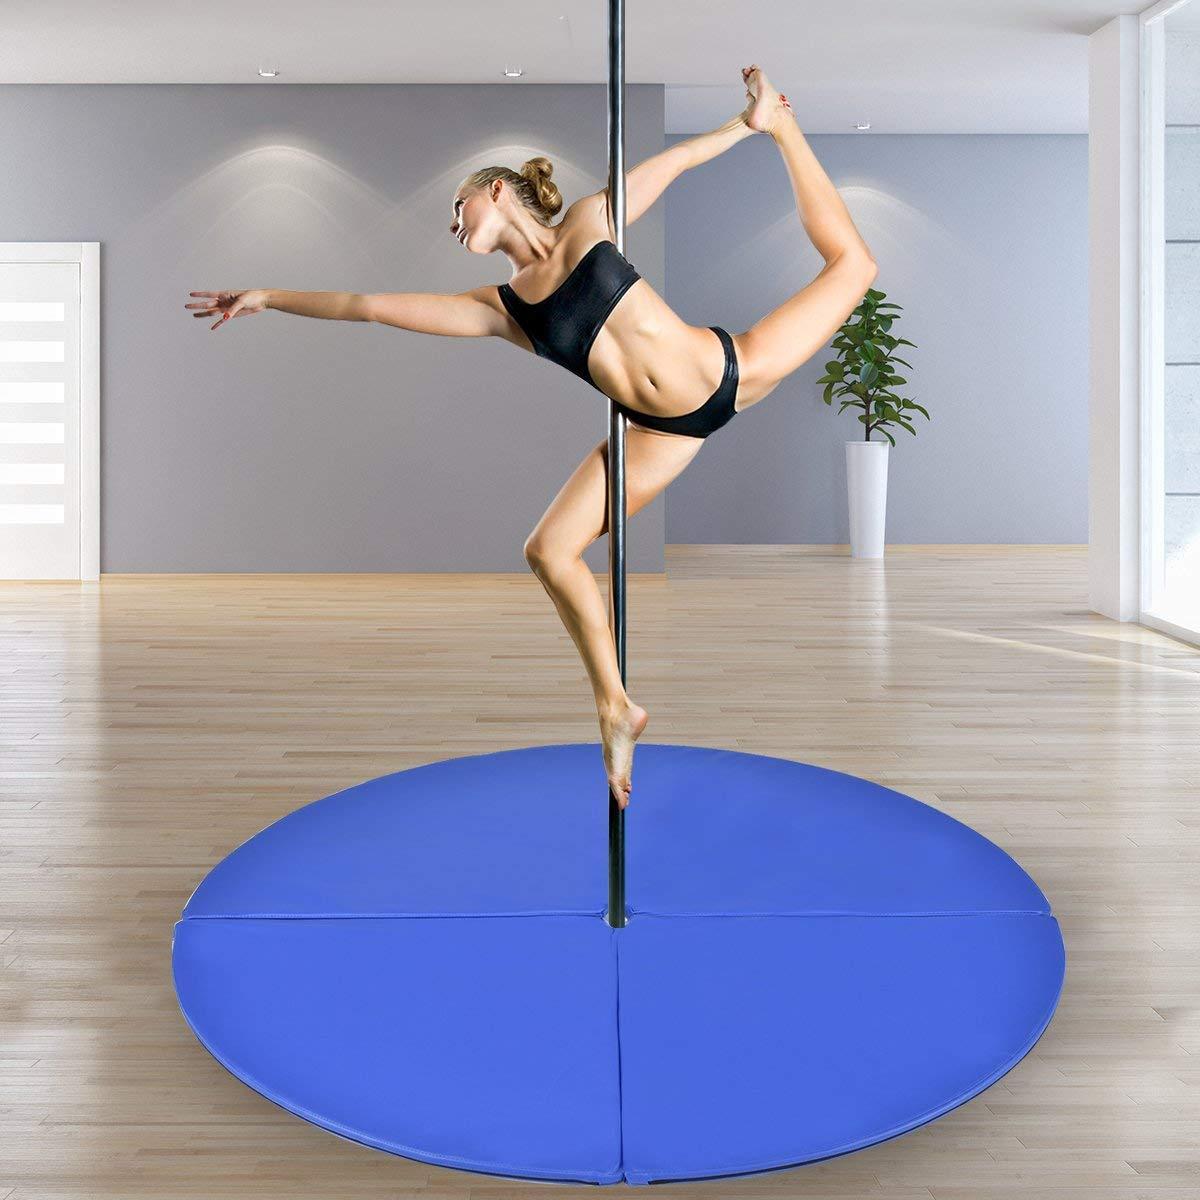 "Tangkula Pole Dance Mat Foldable Yoga Exercise Safety Dancing Cushion Steel Pipe Crash Mat, Dia 5ft x 2"""